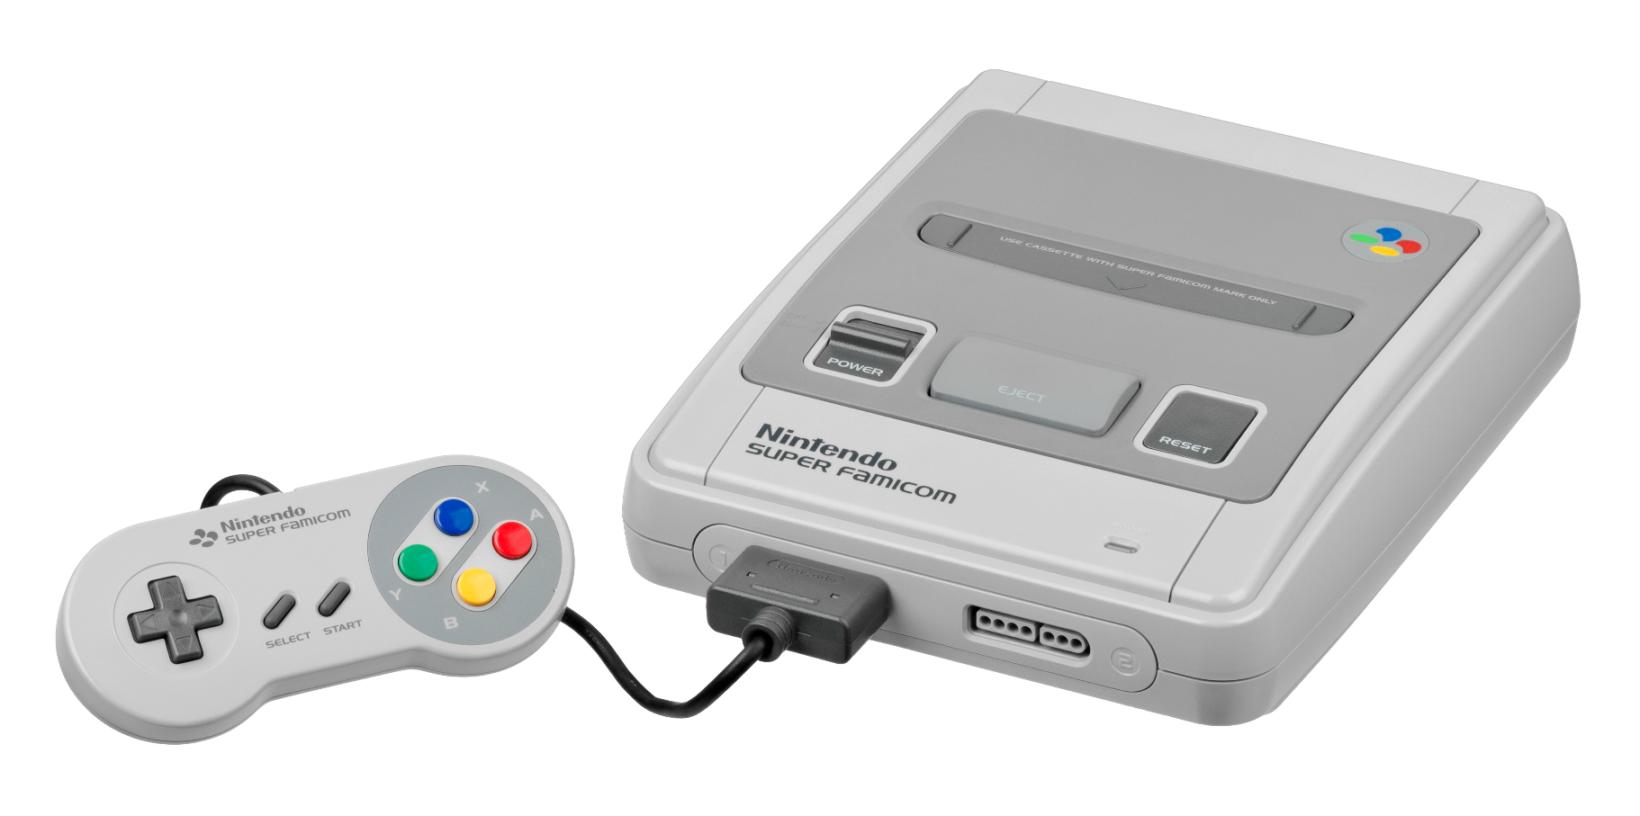 Nintendo might follow up the mini NES with a mini SNES